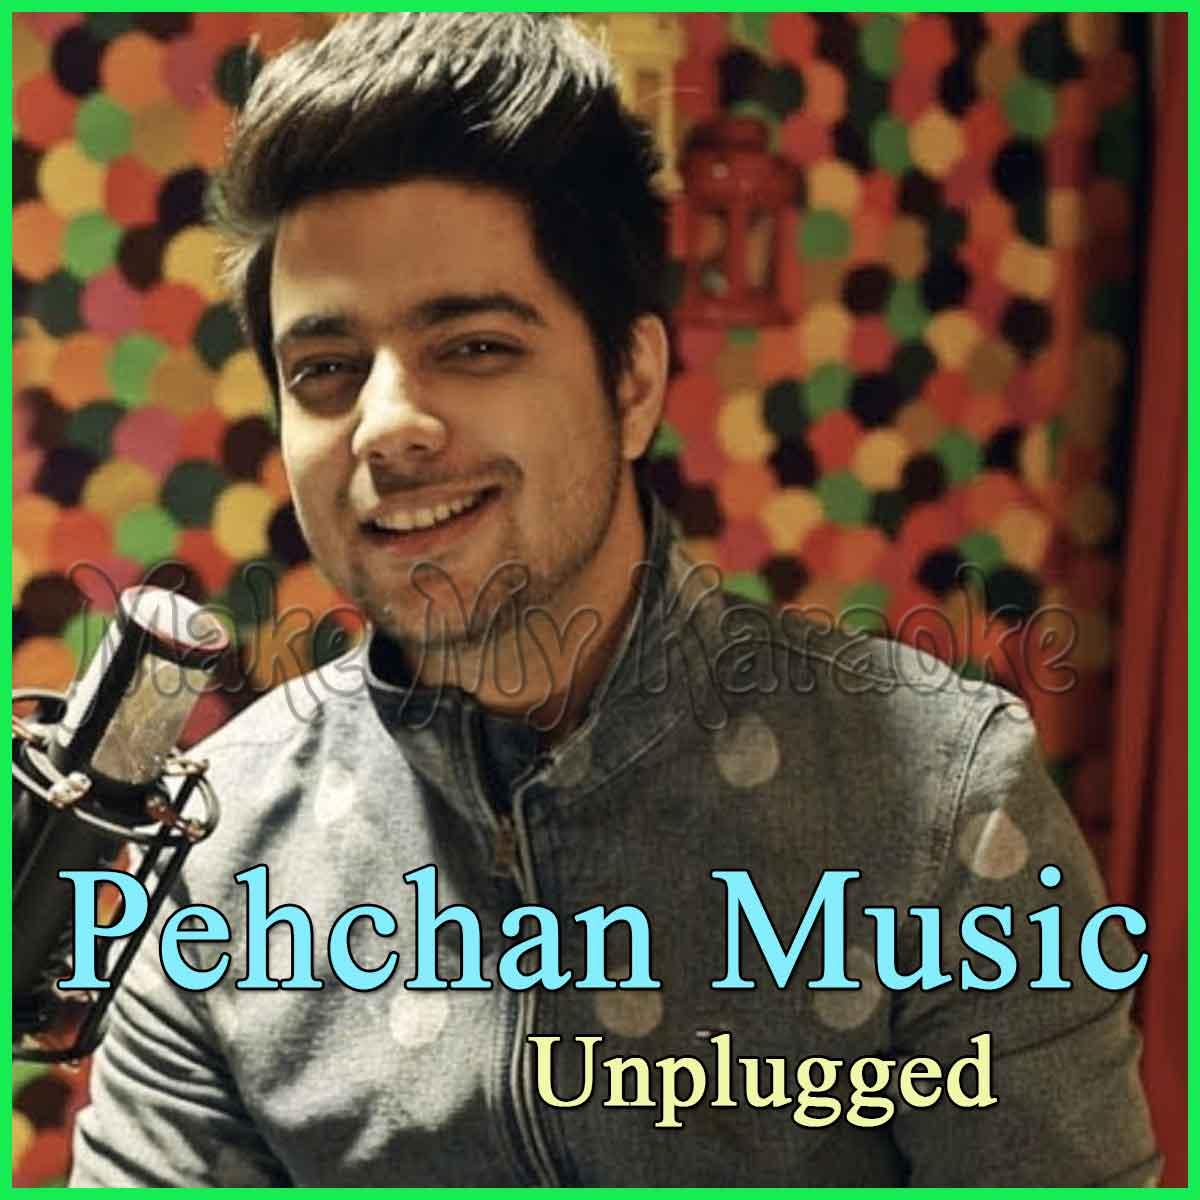 Old Hindi Songs Mashup 2 - Pehchan Music Unplugged (MP3 Format)